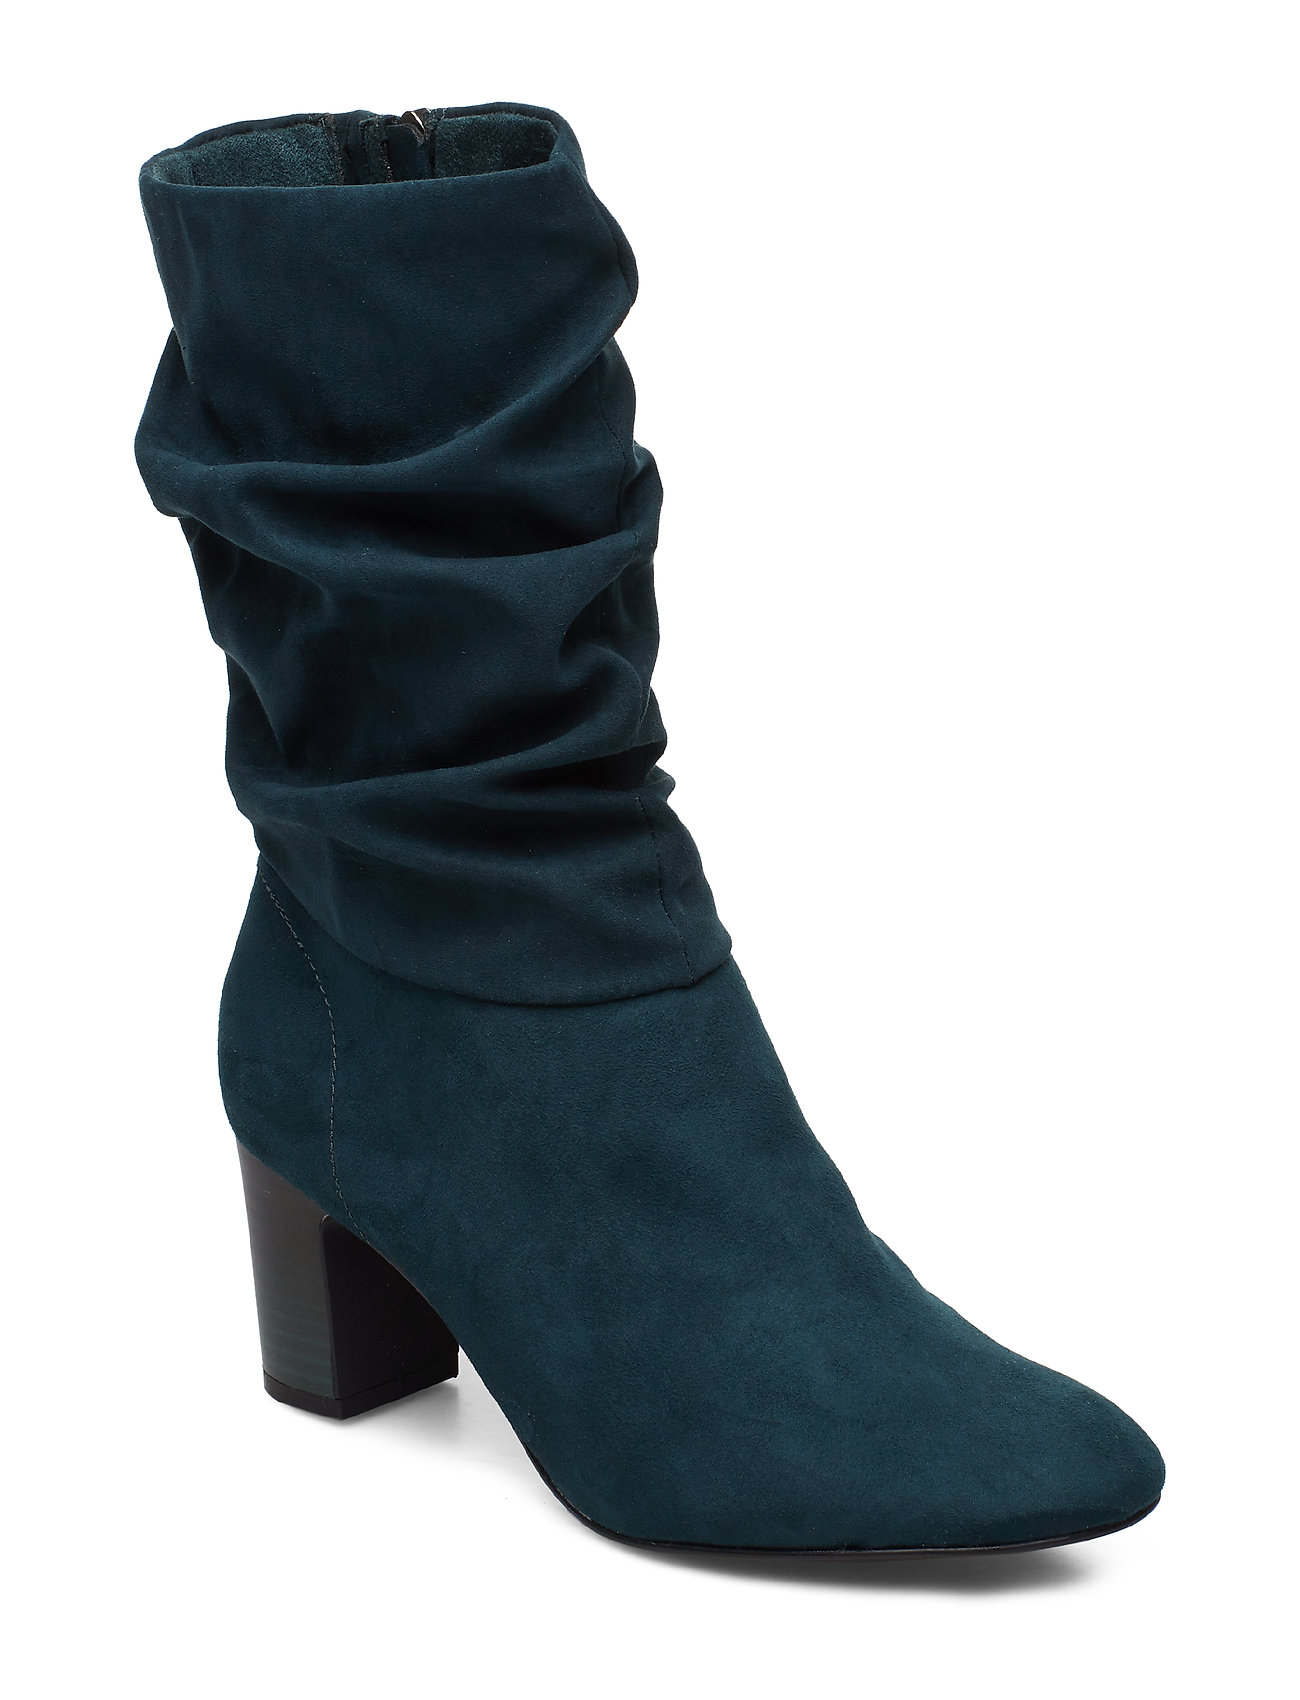 Tamaris Woms Boots - BOTTLE